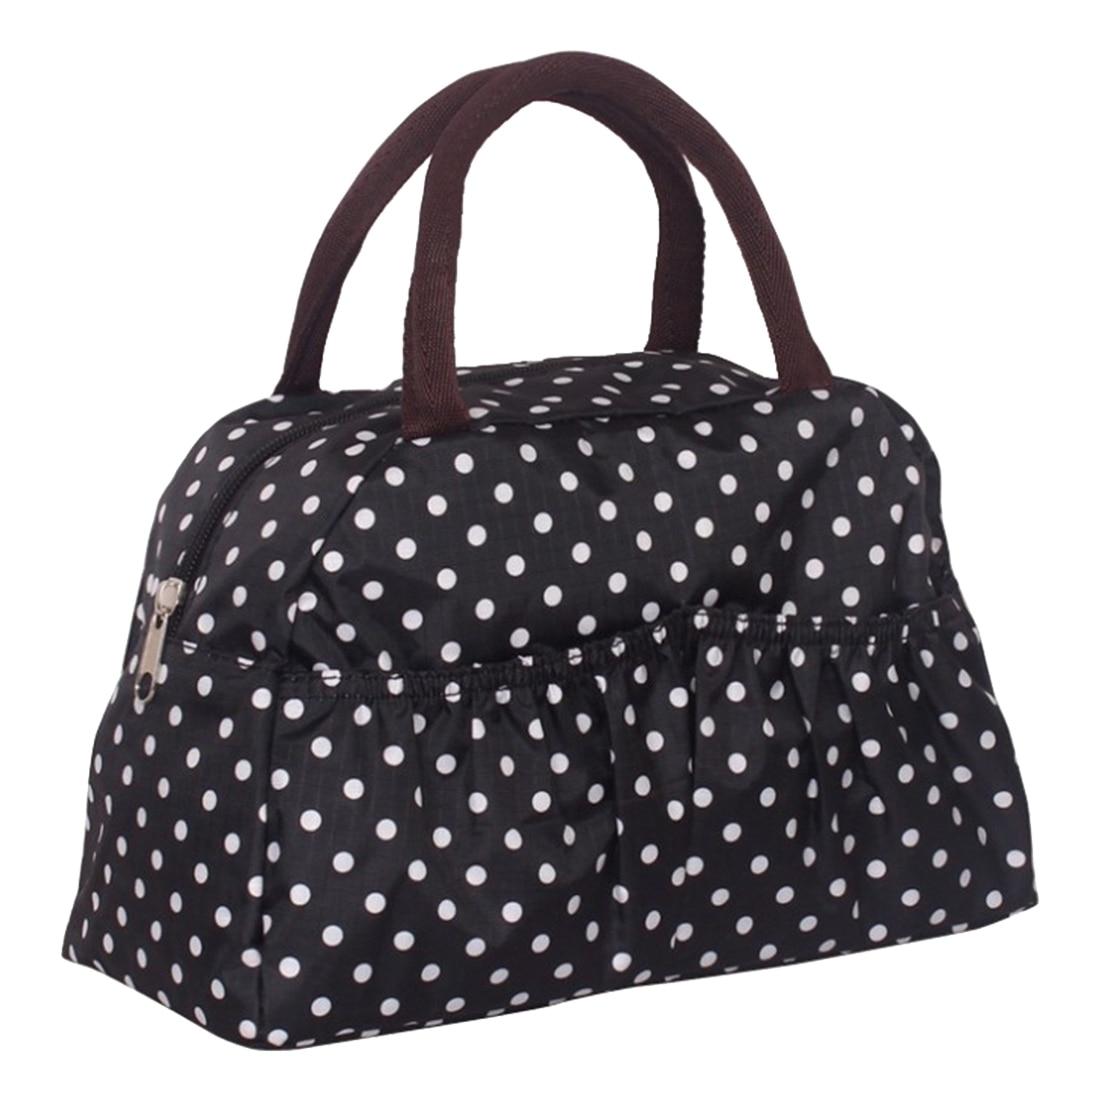 5422a225aedd ✓VSEN New Fashion Lady Femmes Sacs À Main boîte à lunch sac (Style ...